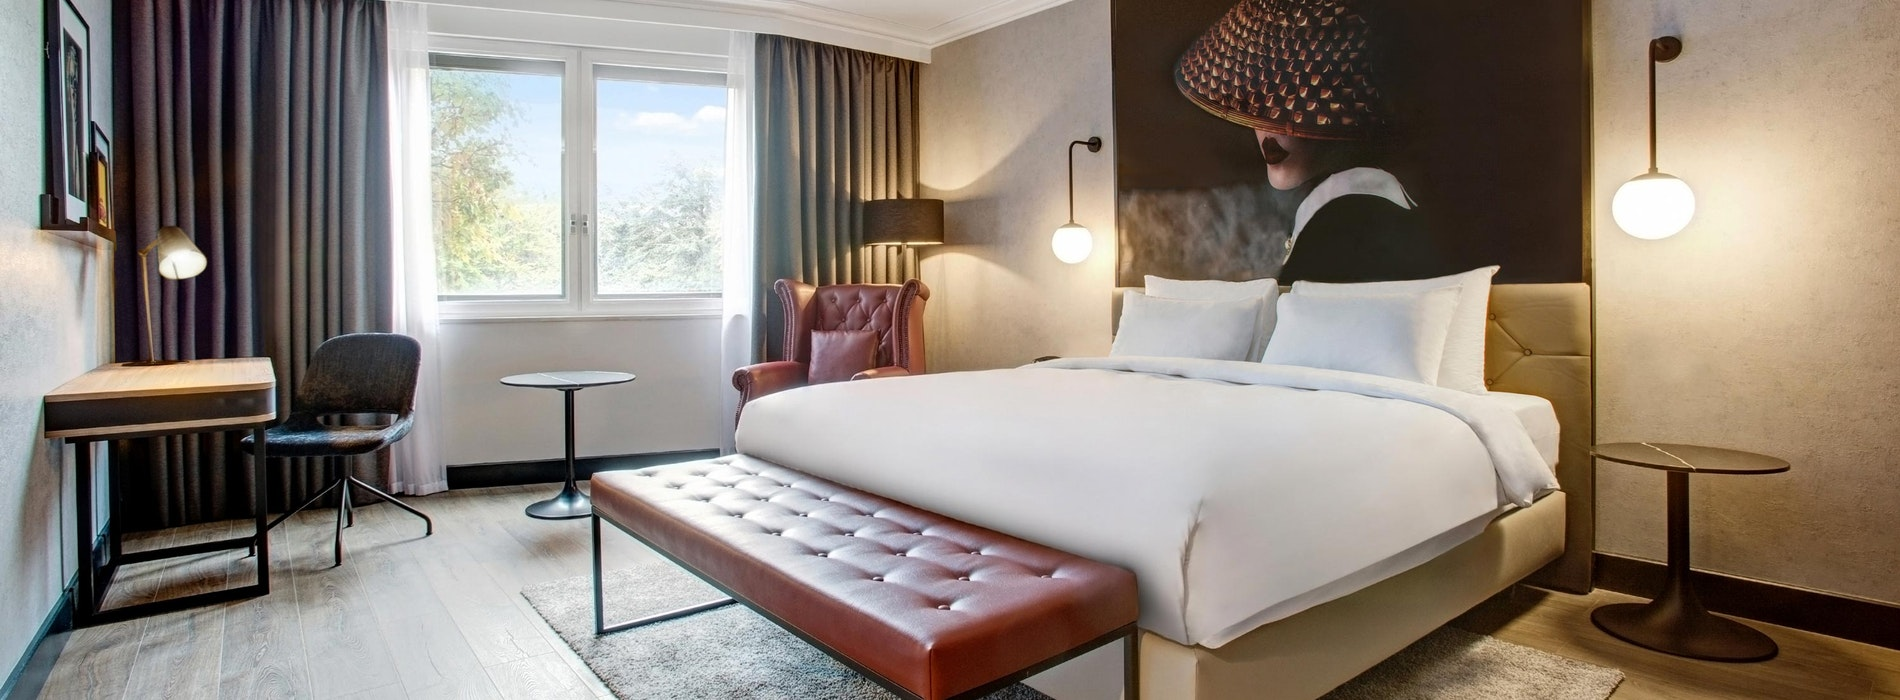 Radisson RED Heathrow near LEGOLAND® Windsor Resort